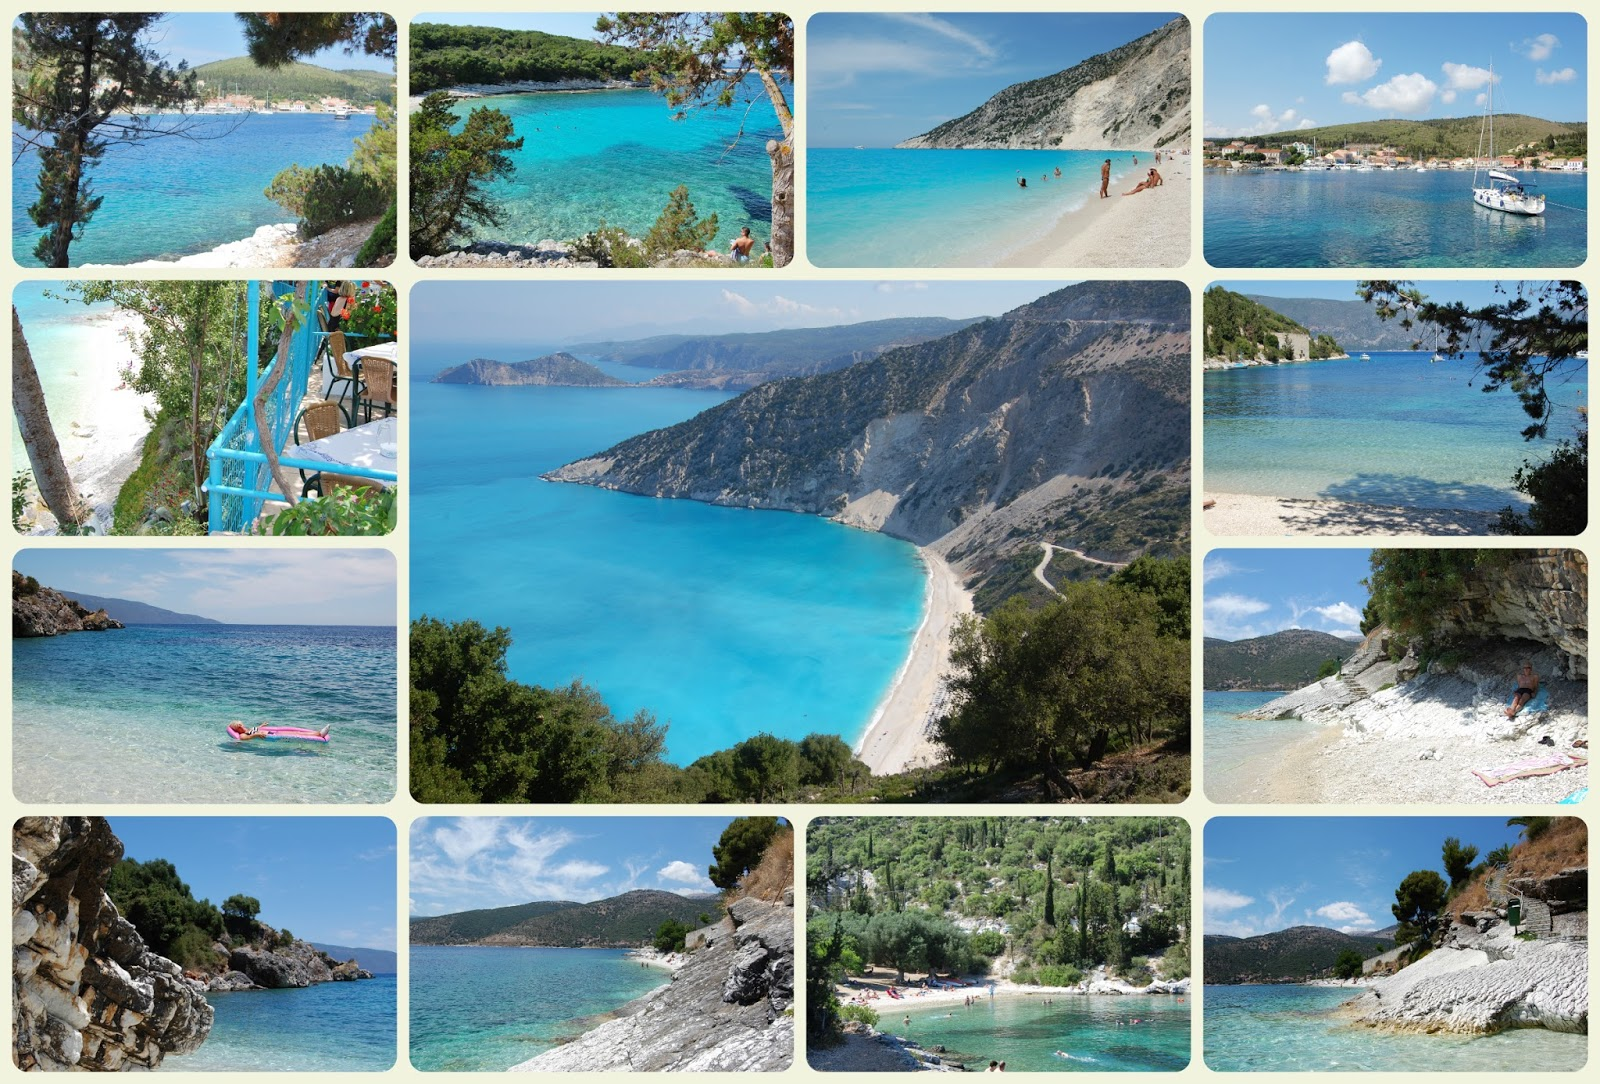 groen eiland griekenland